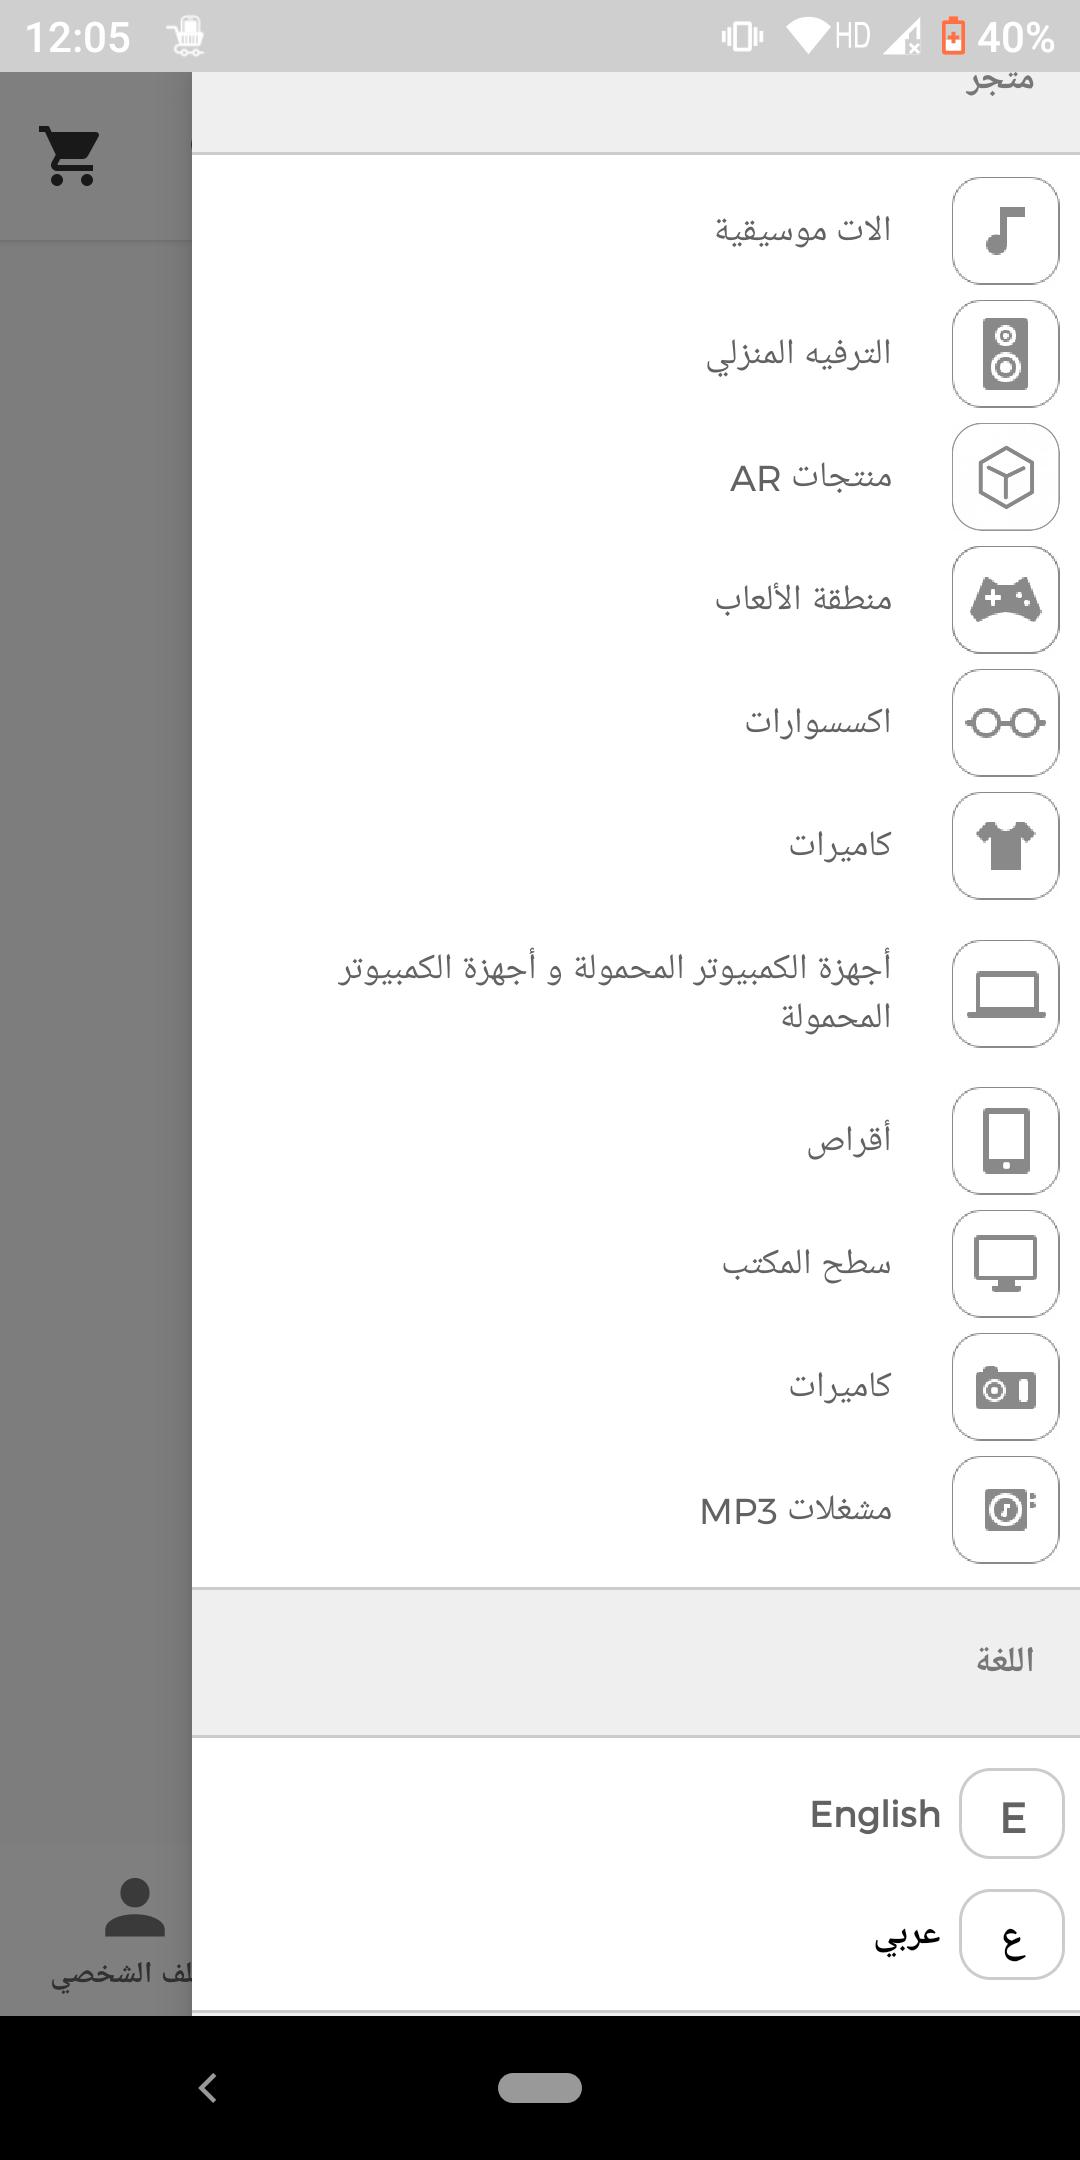 rtl-arabic-language